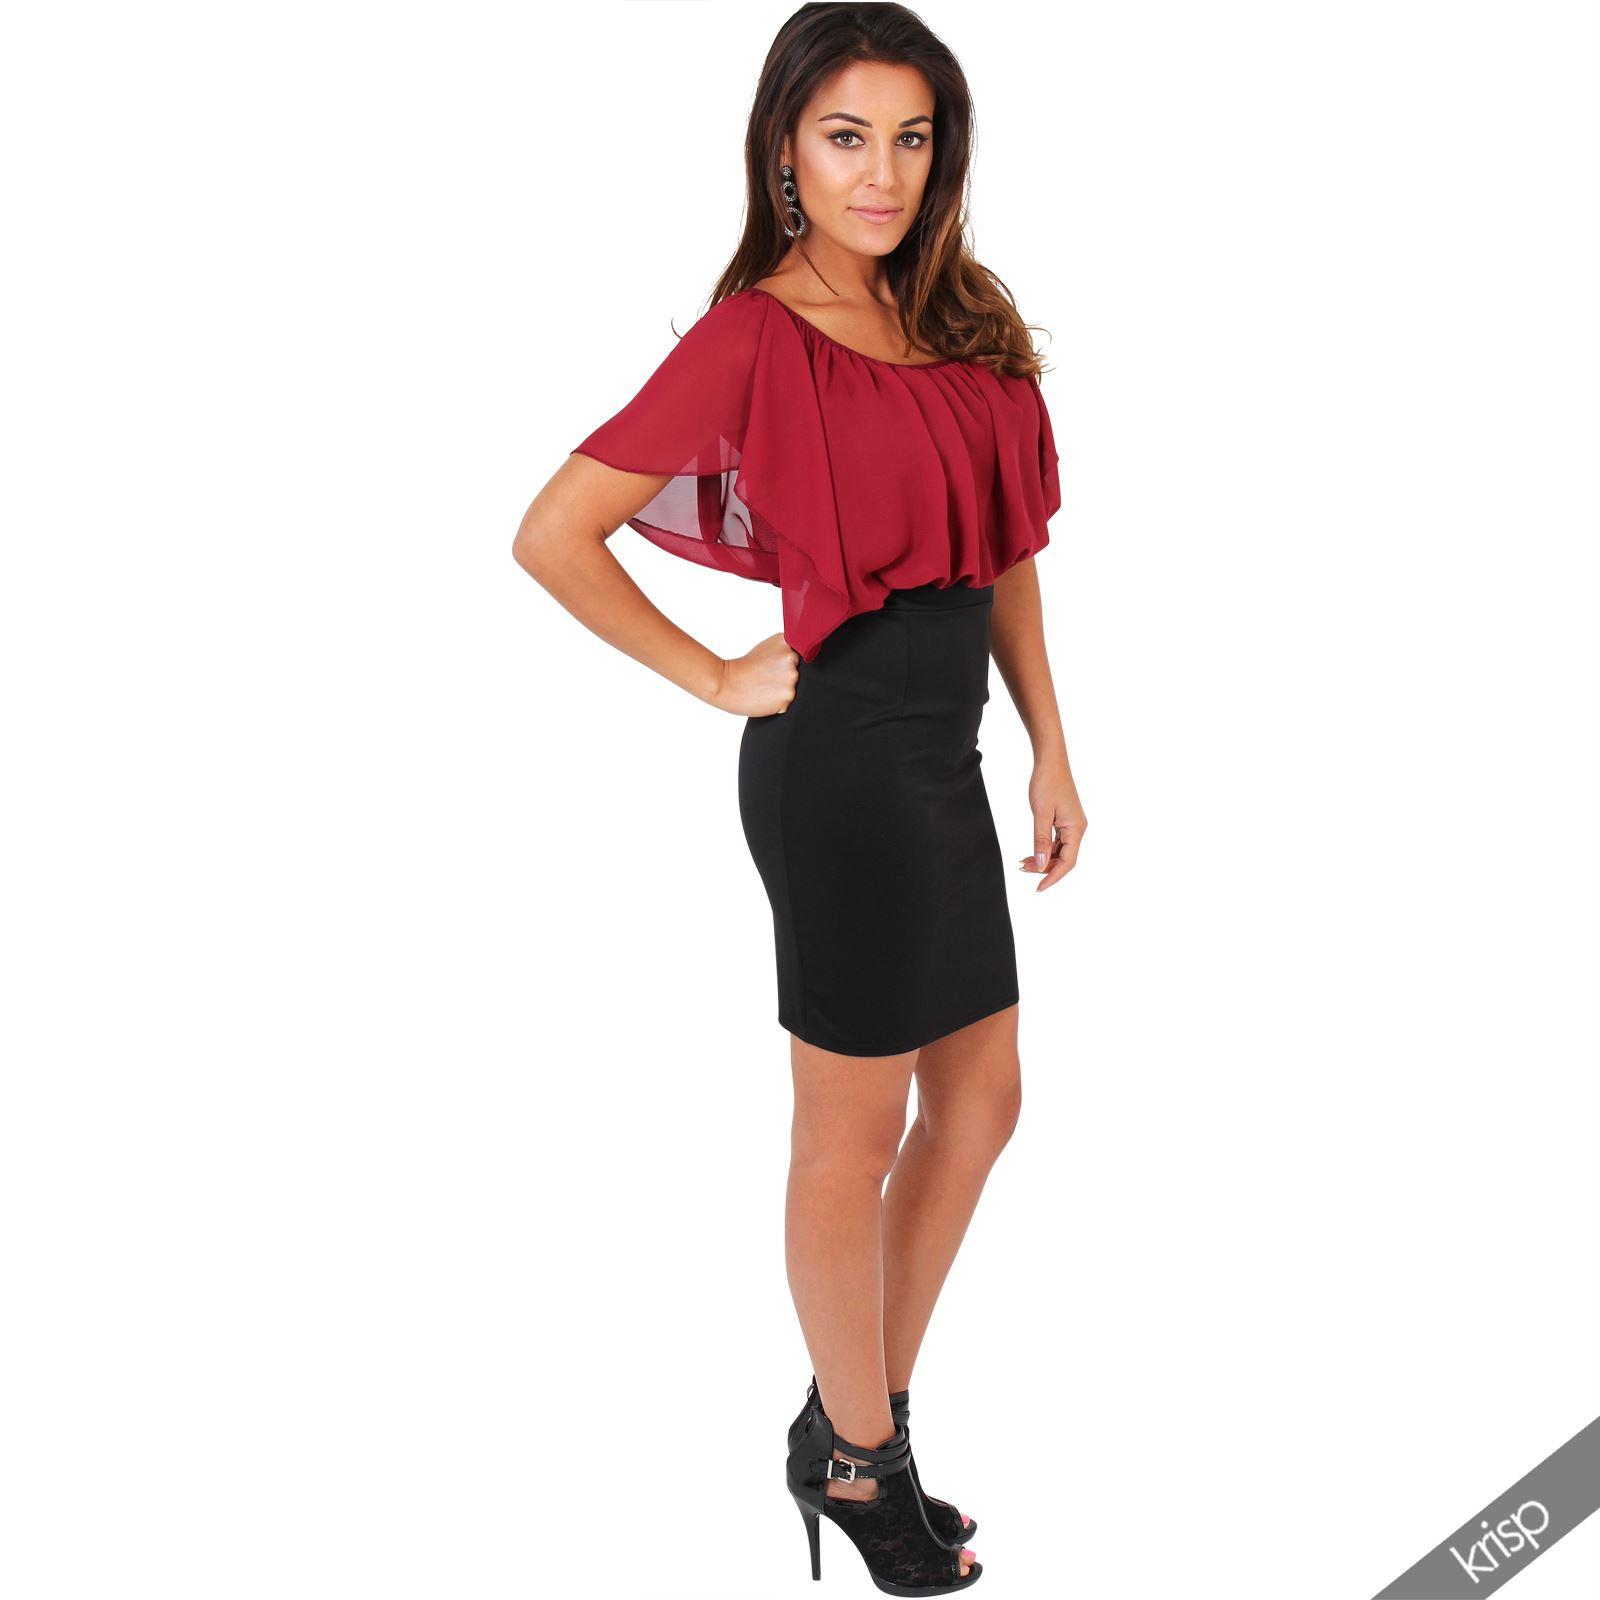 Womens-Pleated-Chiffon-Batwing-Top-High-Waist-Pencil-Bodycon-Skirt-Mini-Dress thumbnail 36